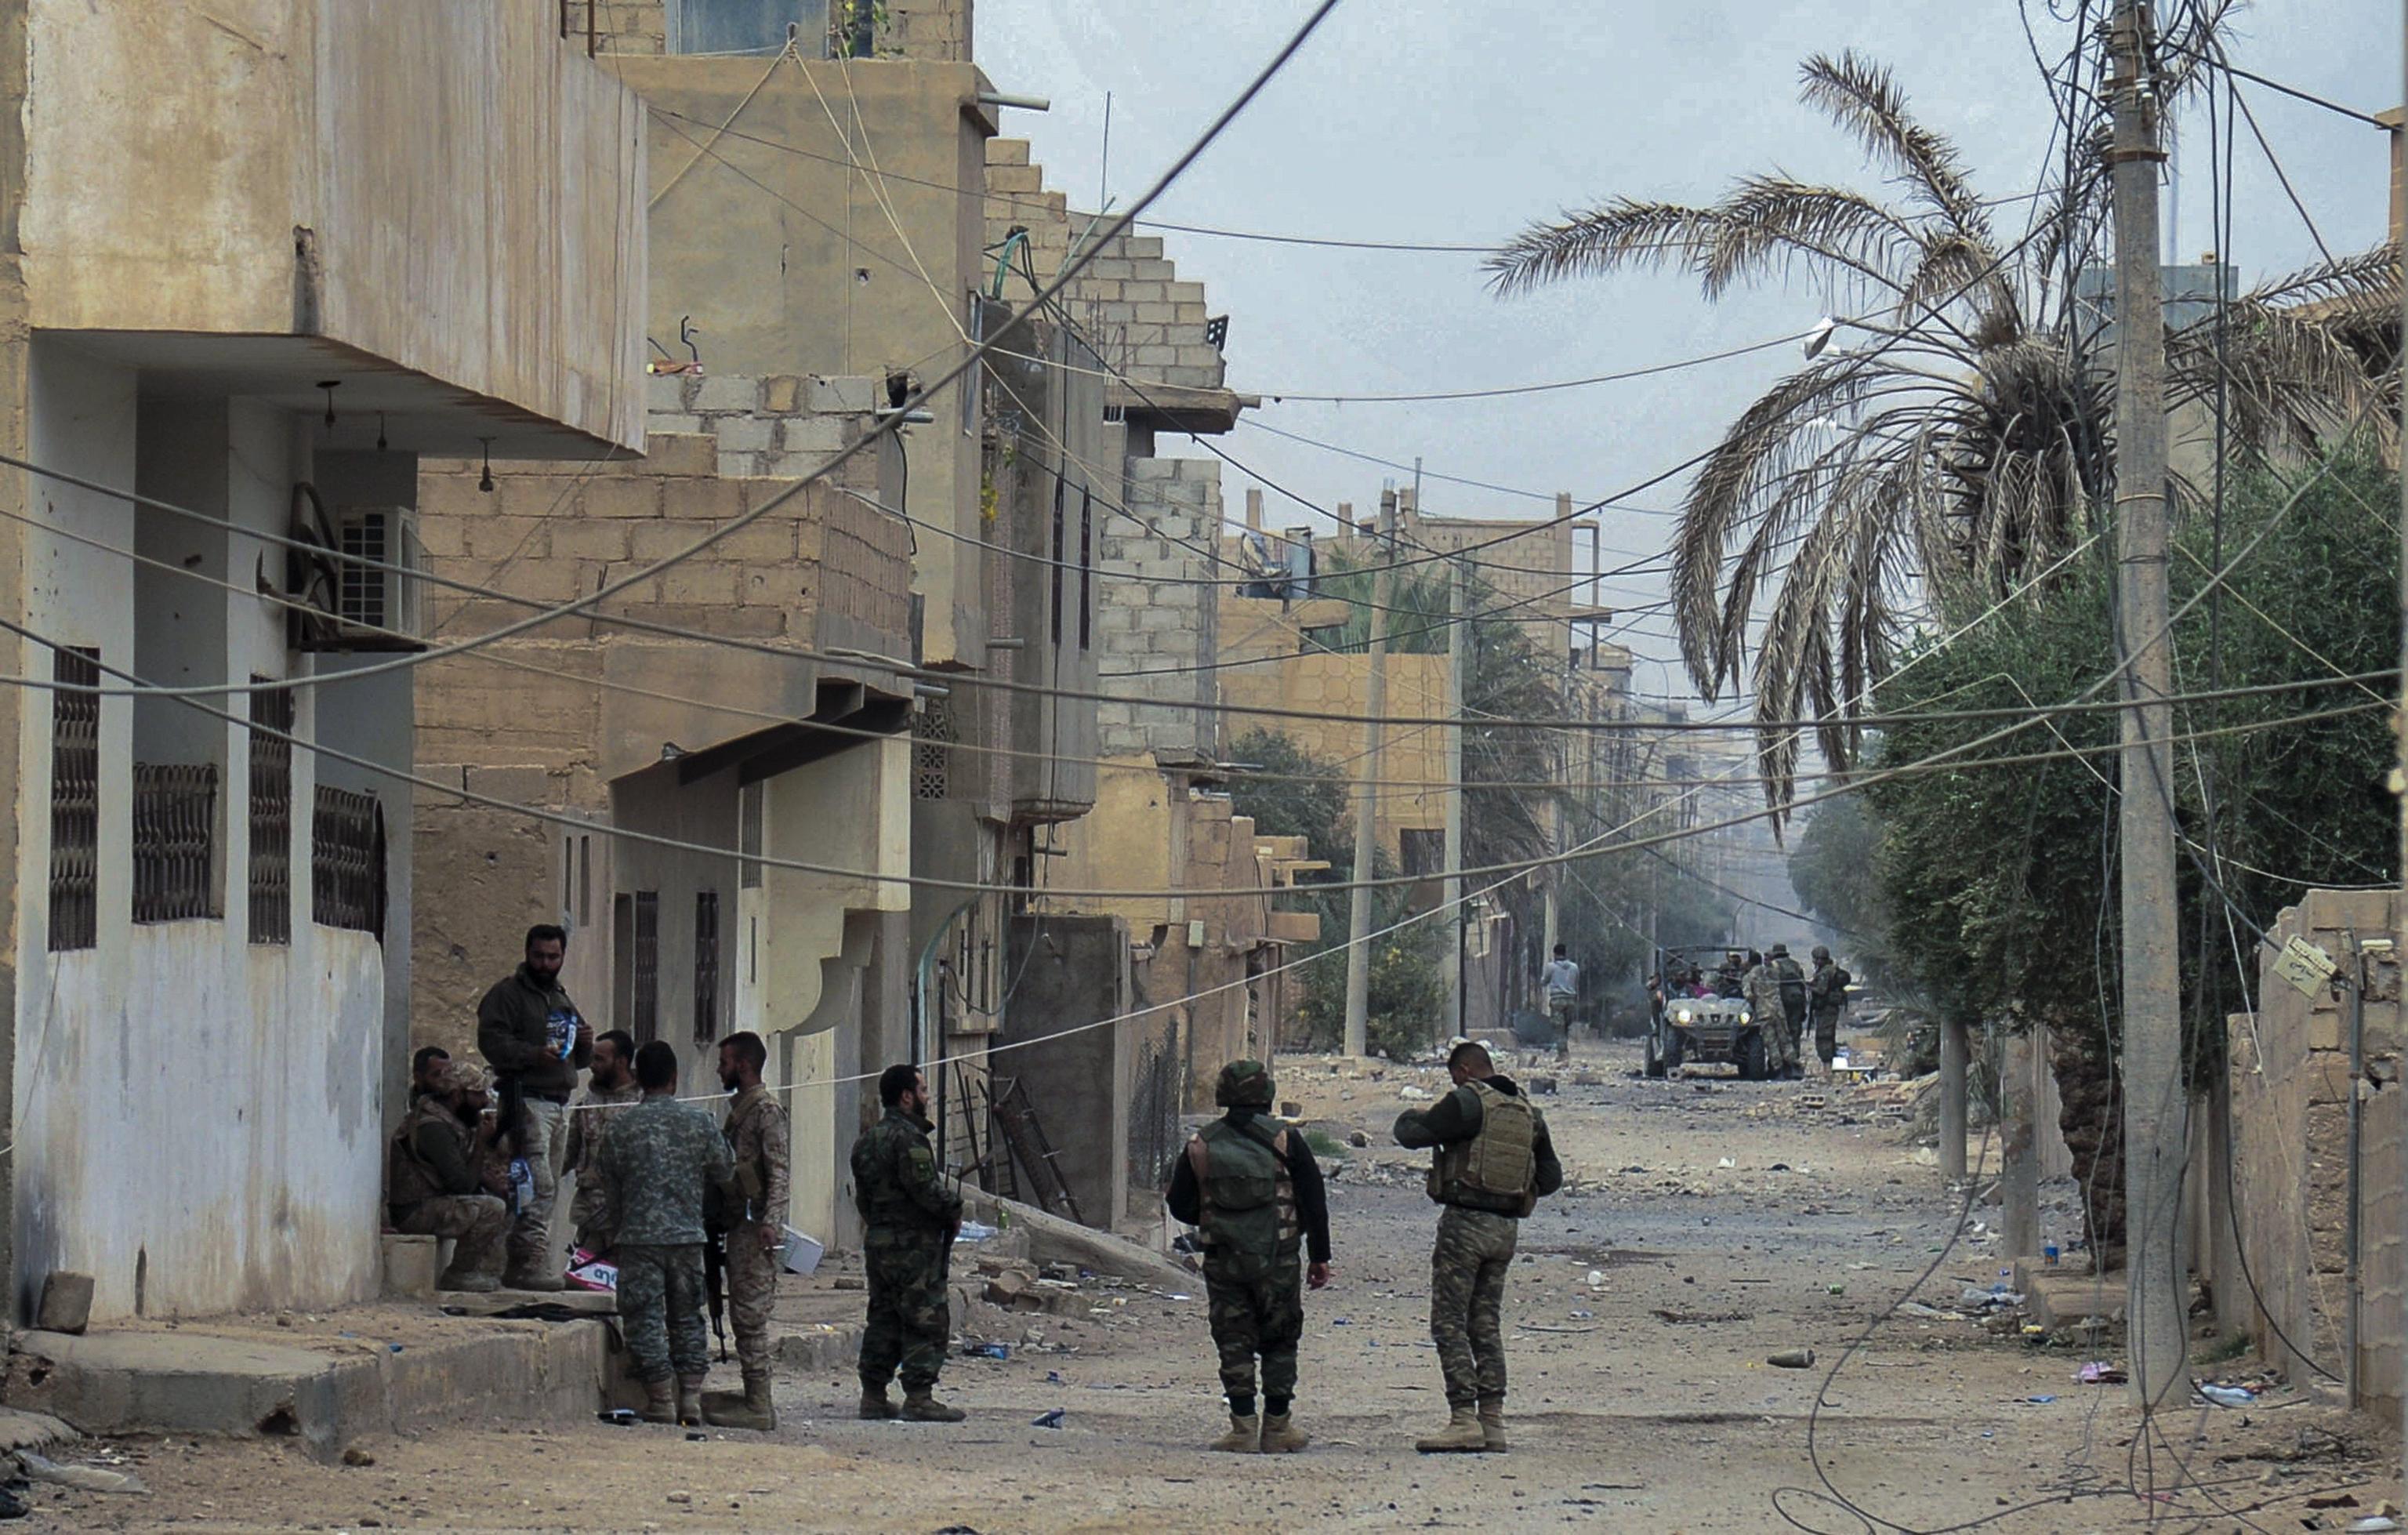 Esercito Siria,Israele sarà responsabile